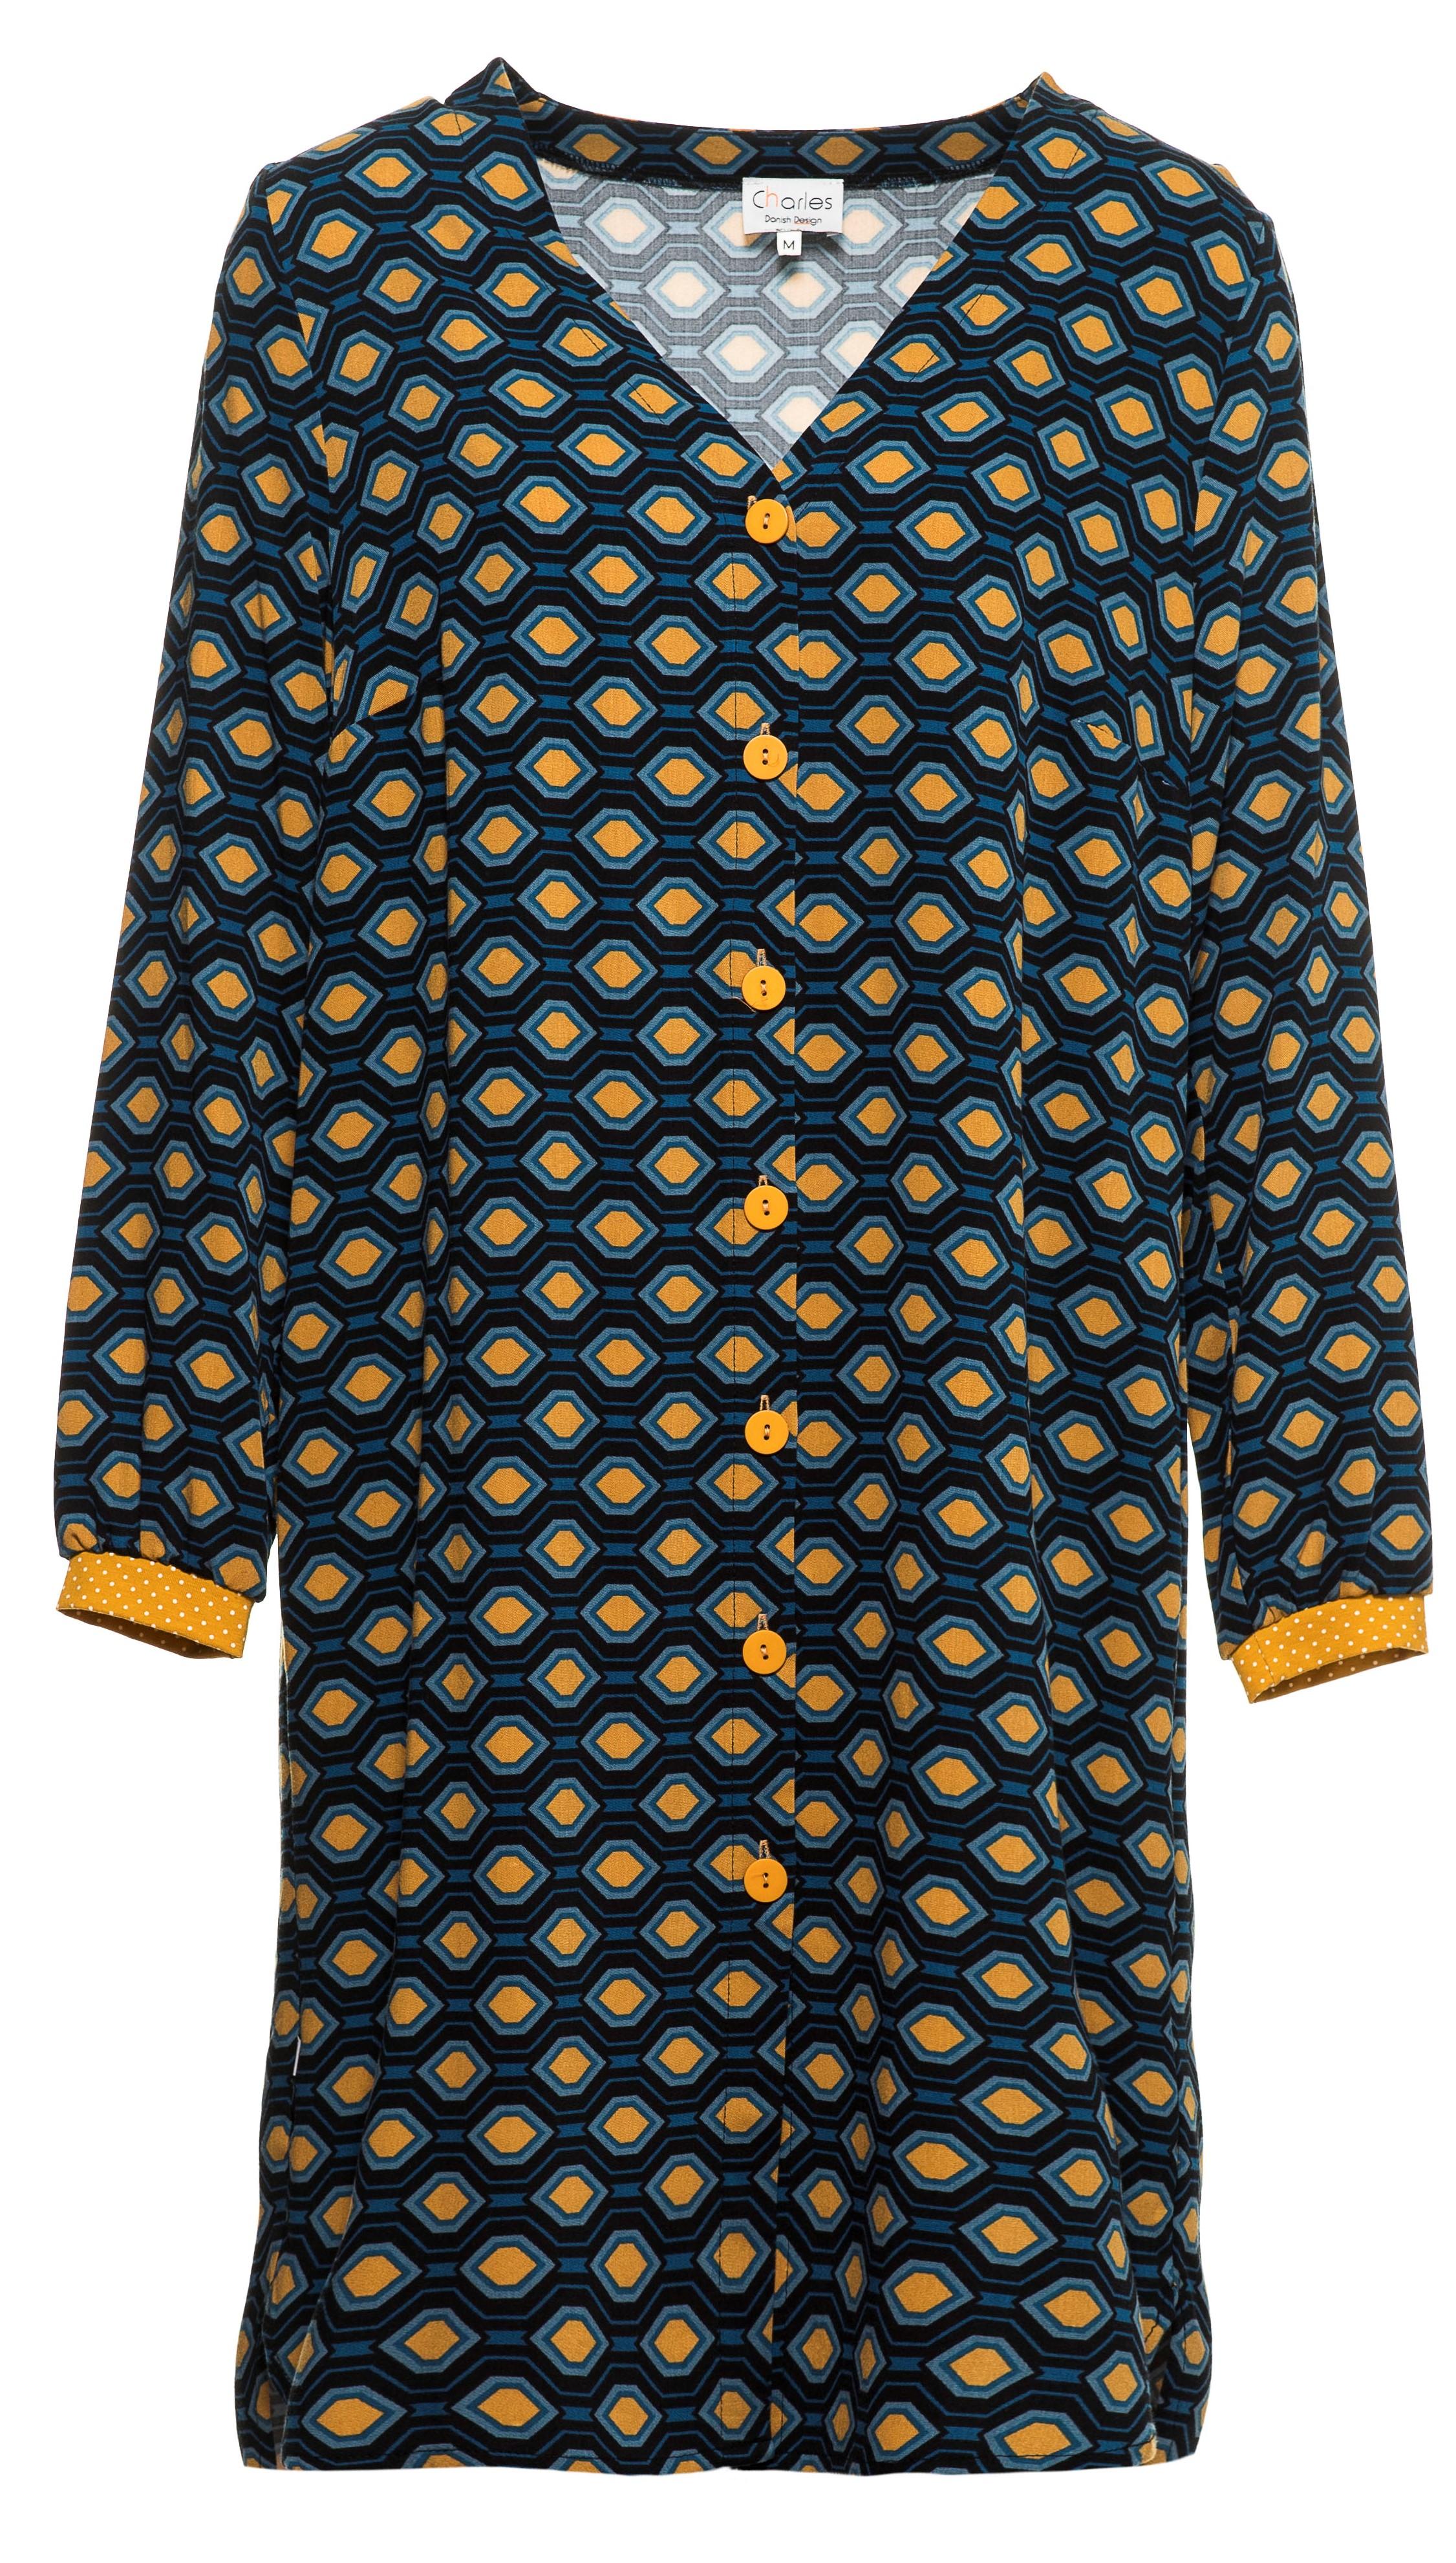 skjorte/kjole før 995,-/NU: 497,50